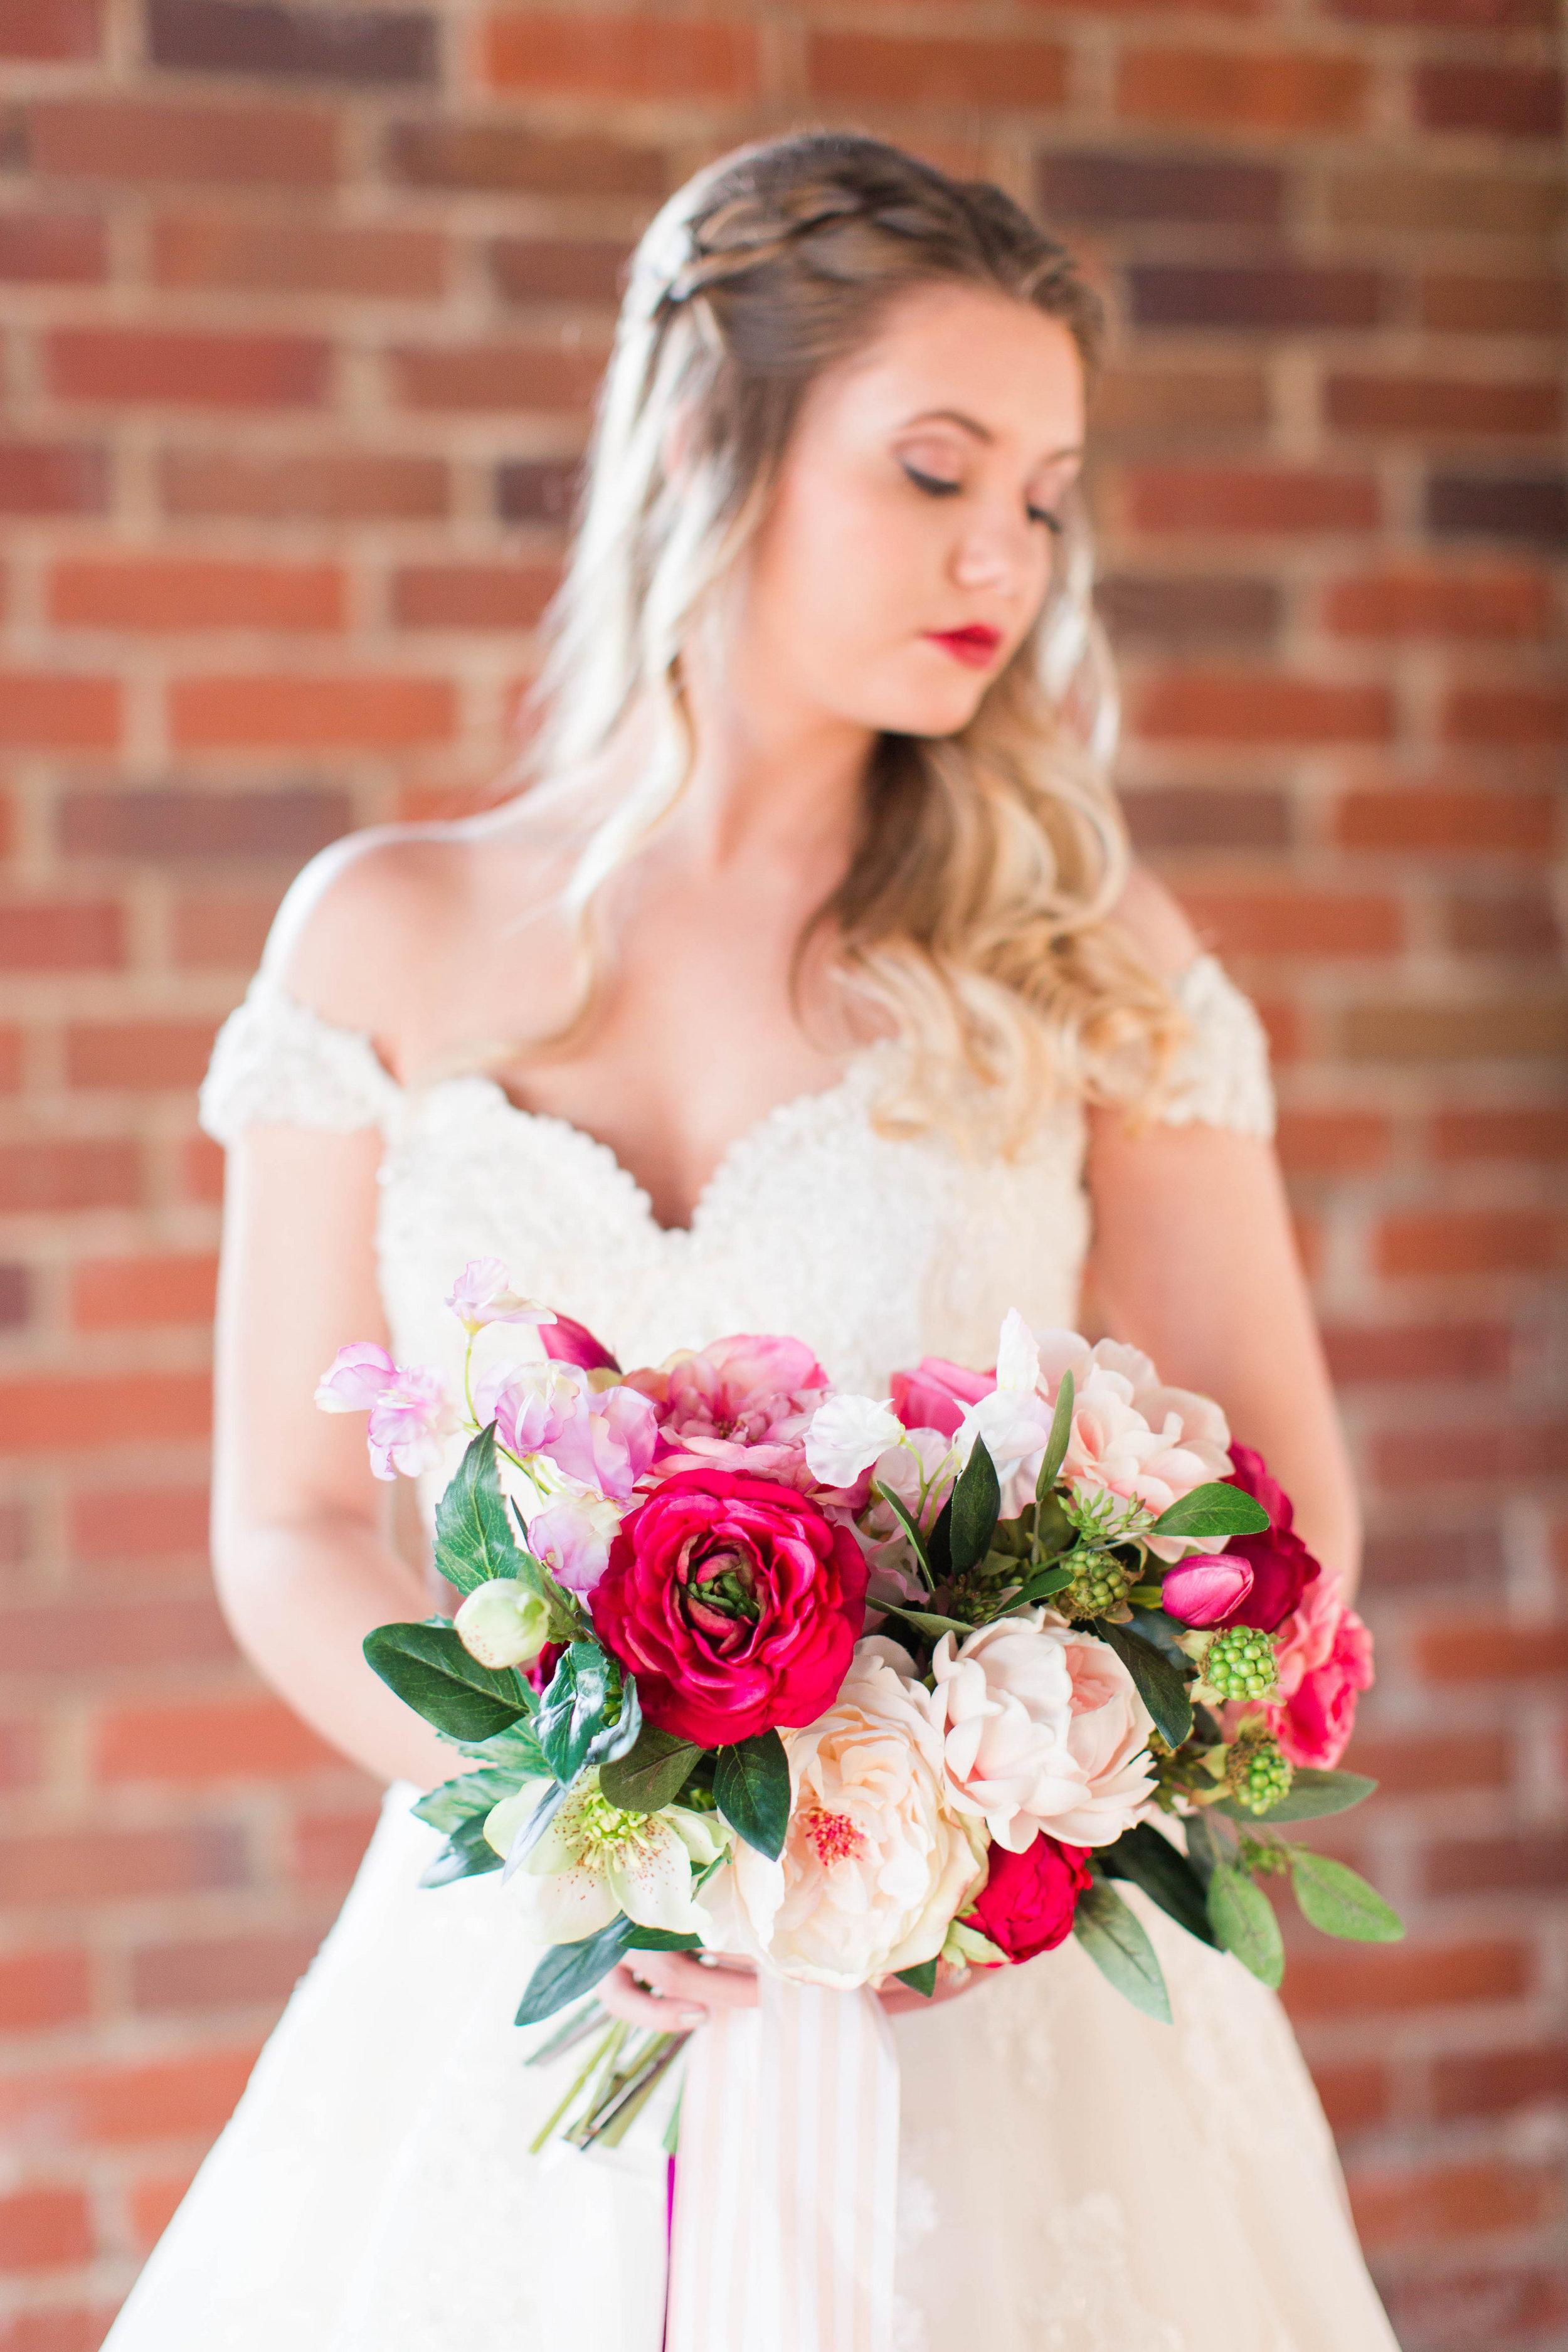 afloral-fake-flower-wedding-ivory-and-beau-bridal-boutique-maggie-sottero-saffron-the-hall-on-vine-wedding-statesboro-wedding-savannah-wedding-kristian-designs-rachel-strickland-photography-savannah-bridal-southern-bride-savannah-bride-1.jpg